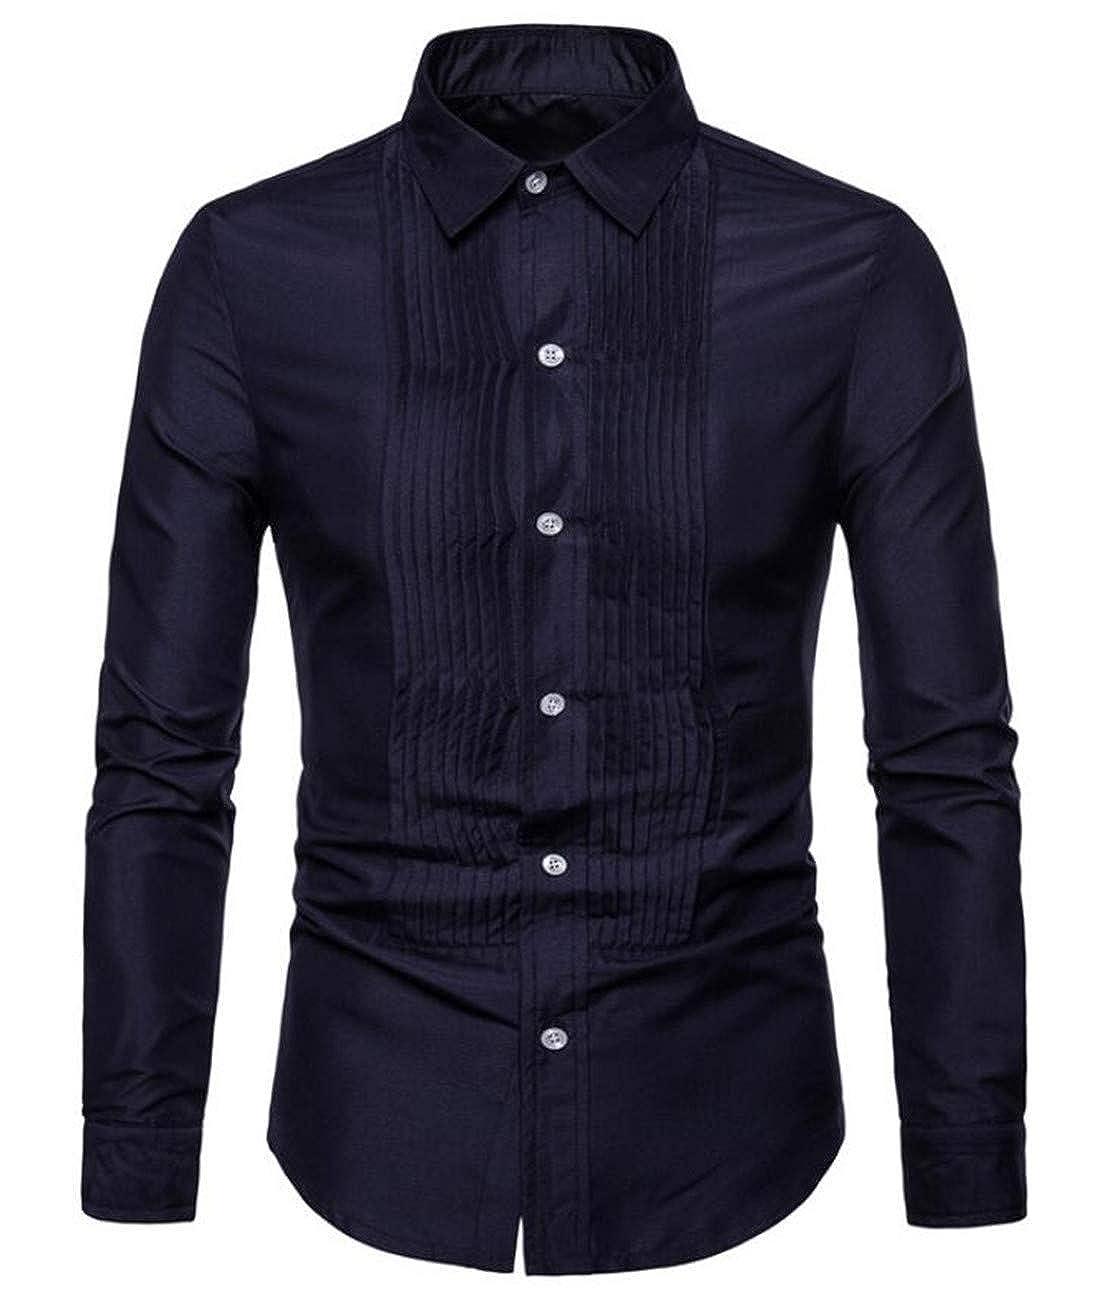 Nanquan Men Slim Fit Business Casual Cotton Long Sleeves Dress Shirt